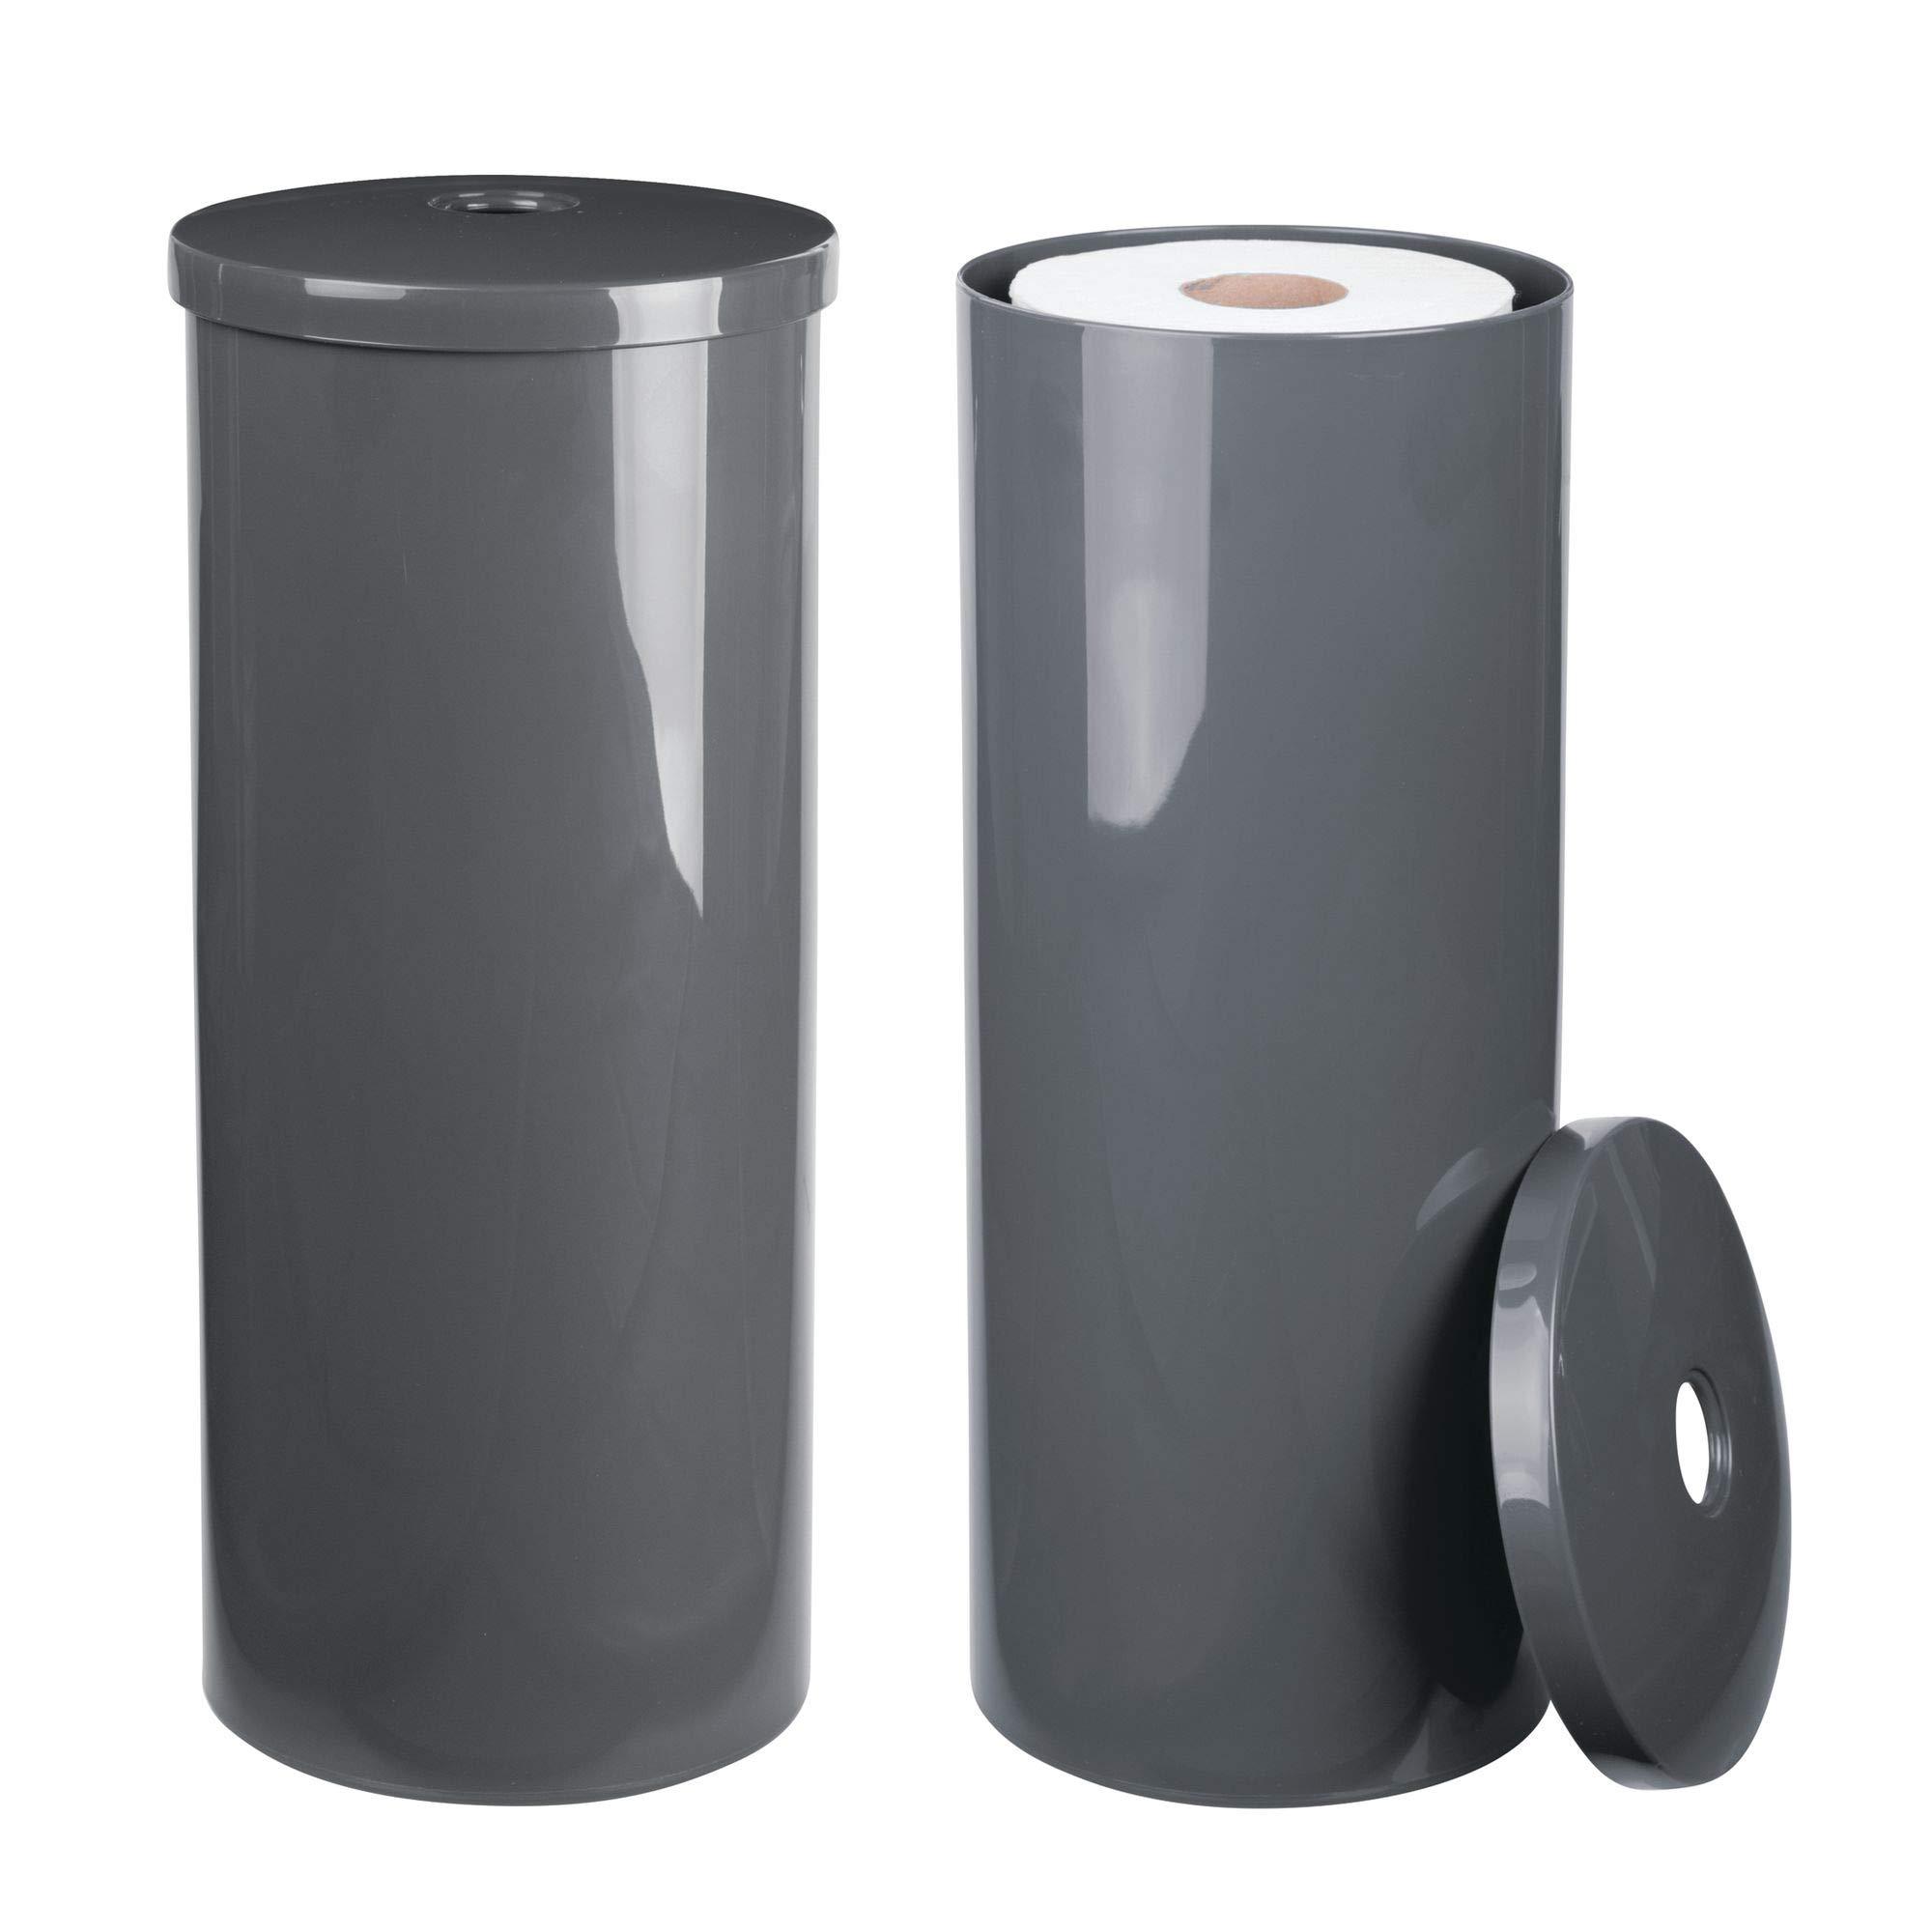 mDesign Modern Plastic Toilet Tissue Paper Roll Holder Canister Stand with Lid - Vertical Bathroom Storage for 3 Rolls of Toilet Tissue - Holds Large Mega Rolls - 2 Pack, Slate Gray